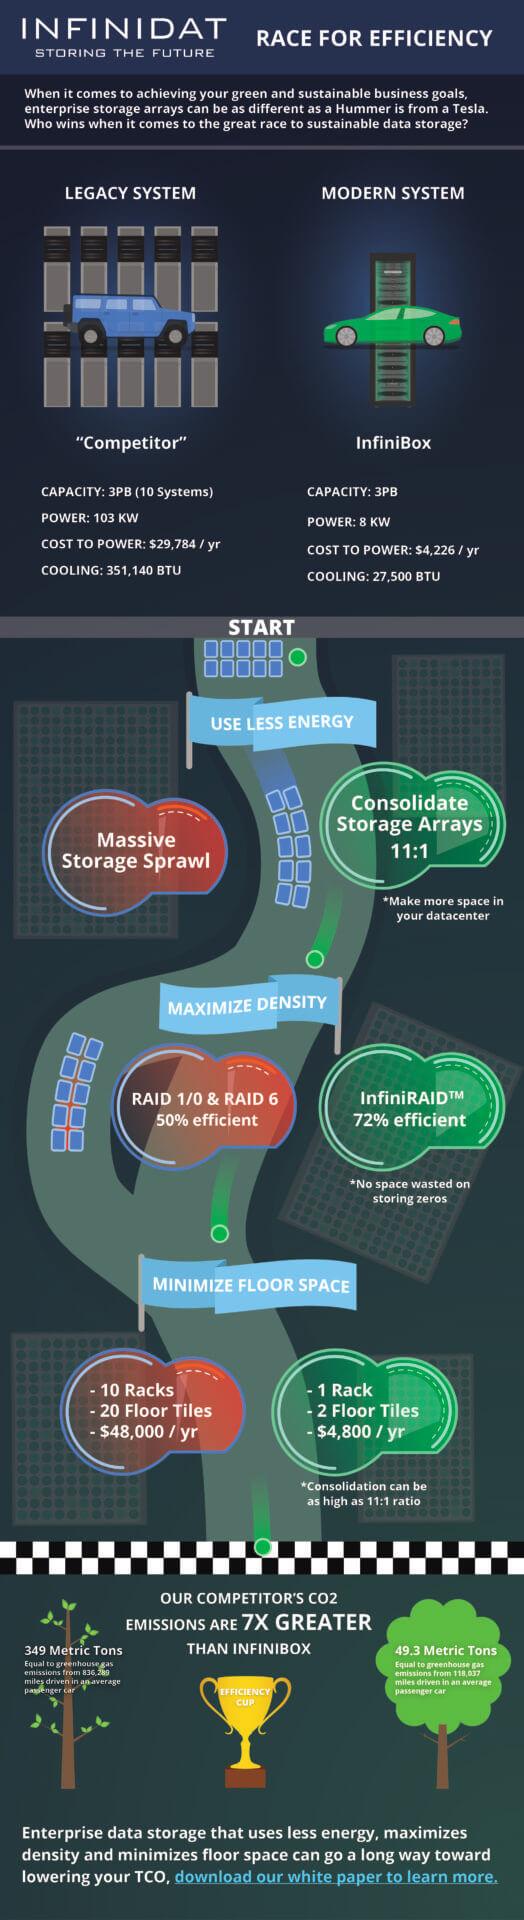 InfiniBox Infographic